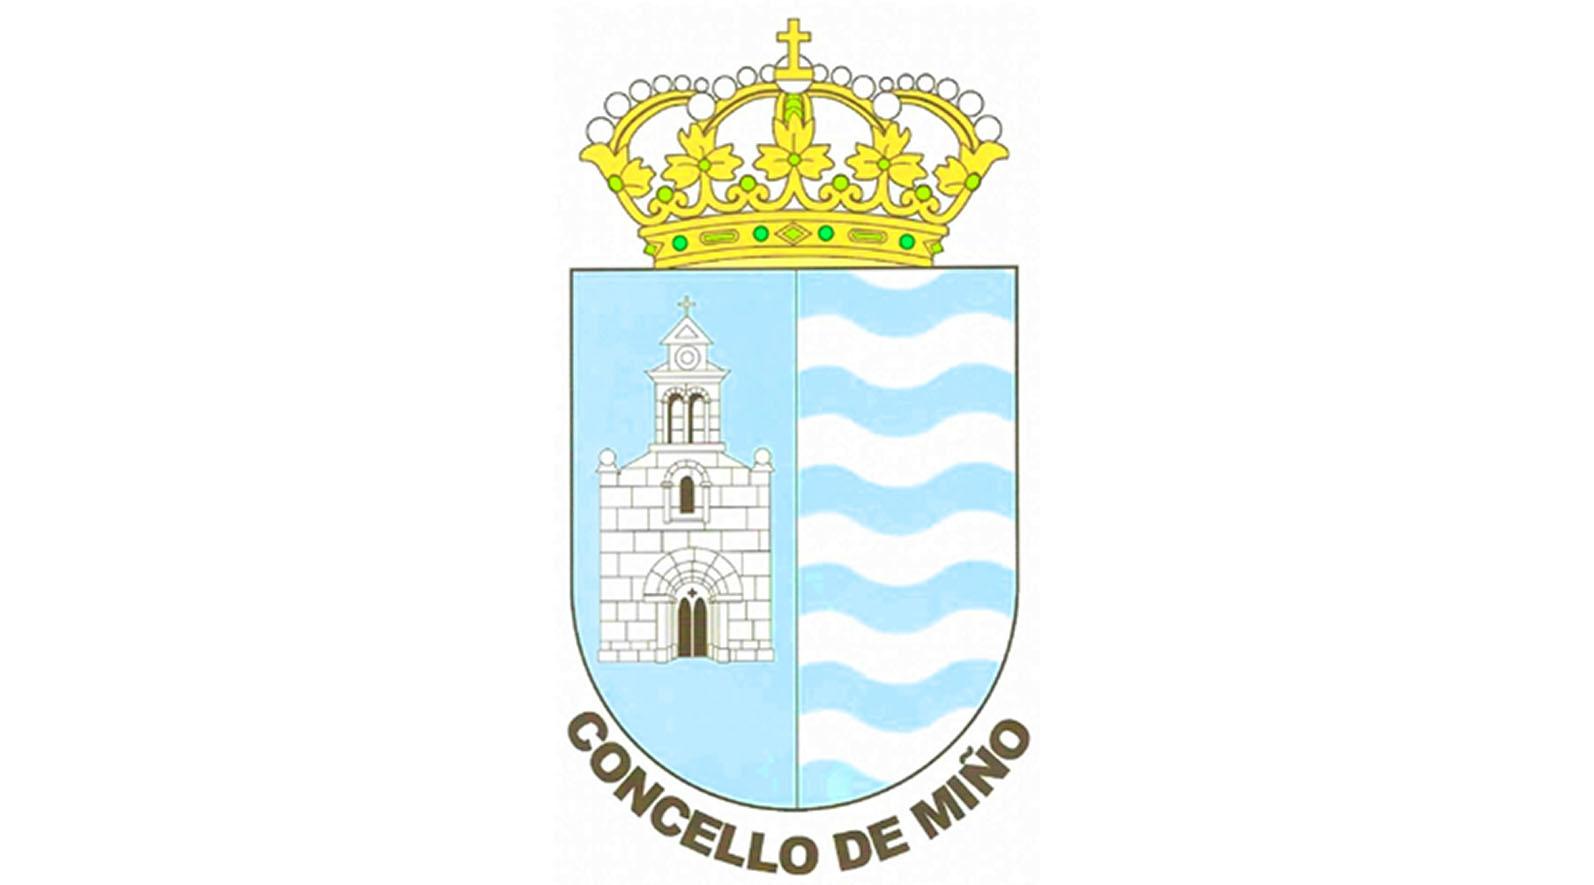 concello escudo copia